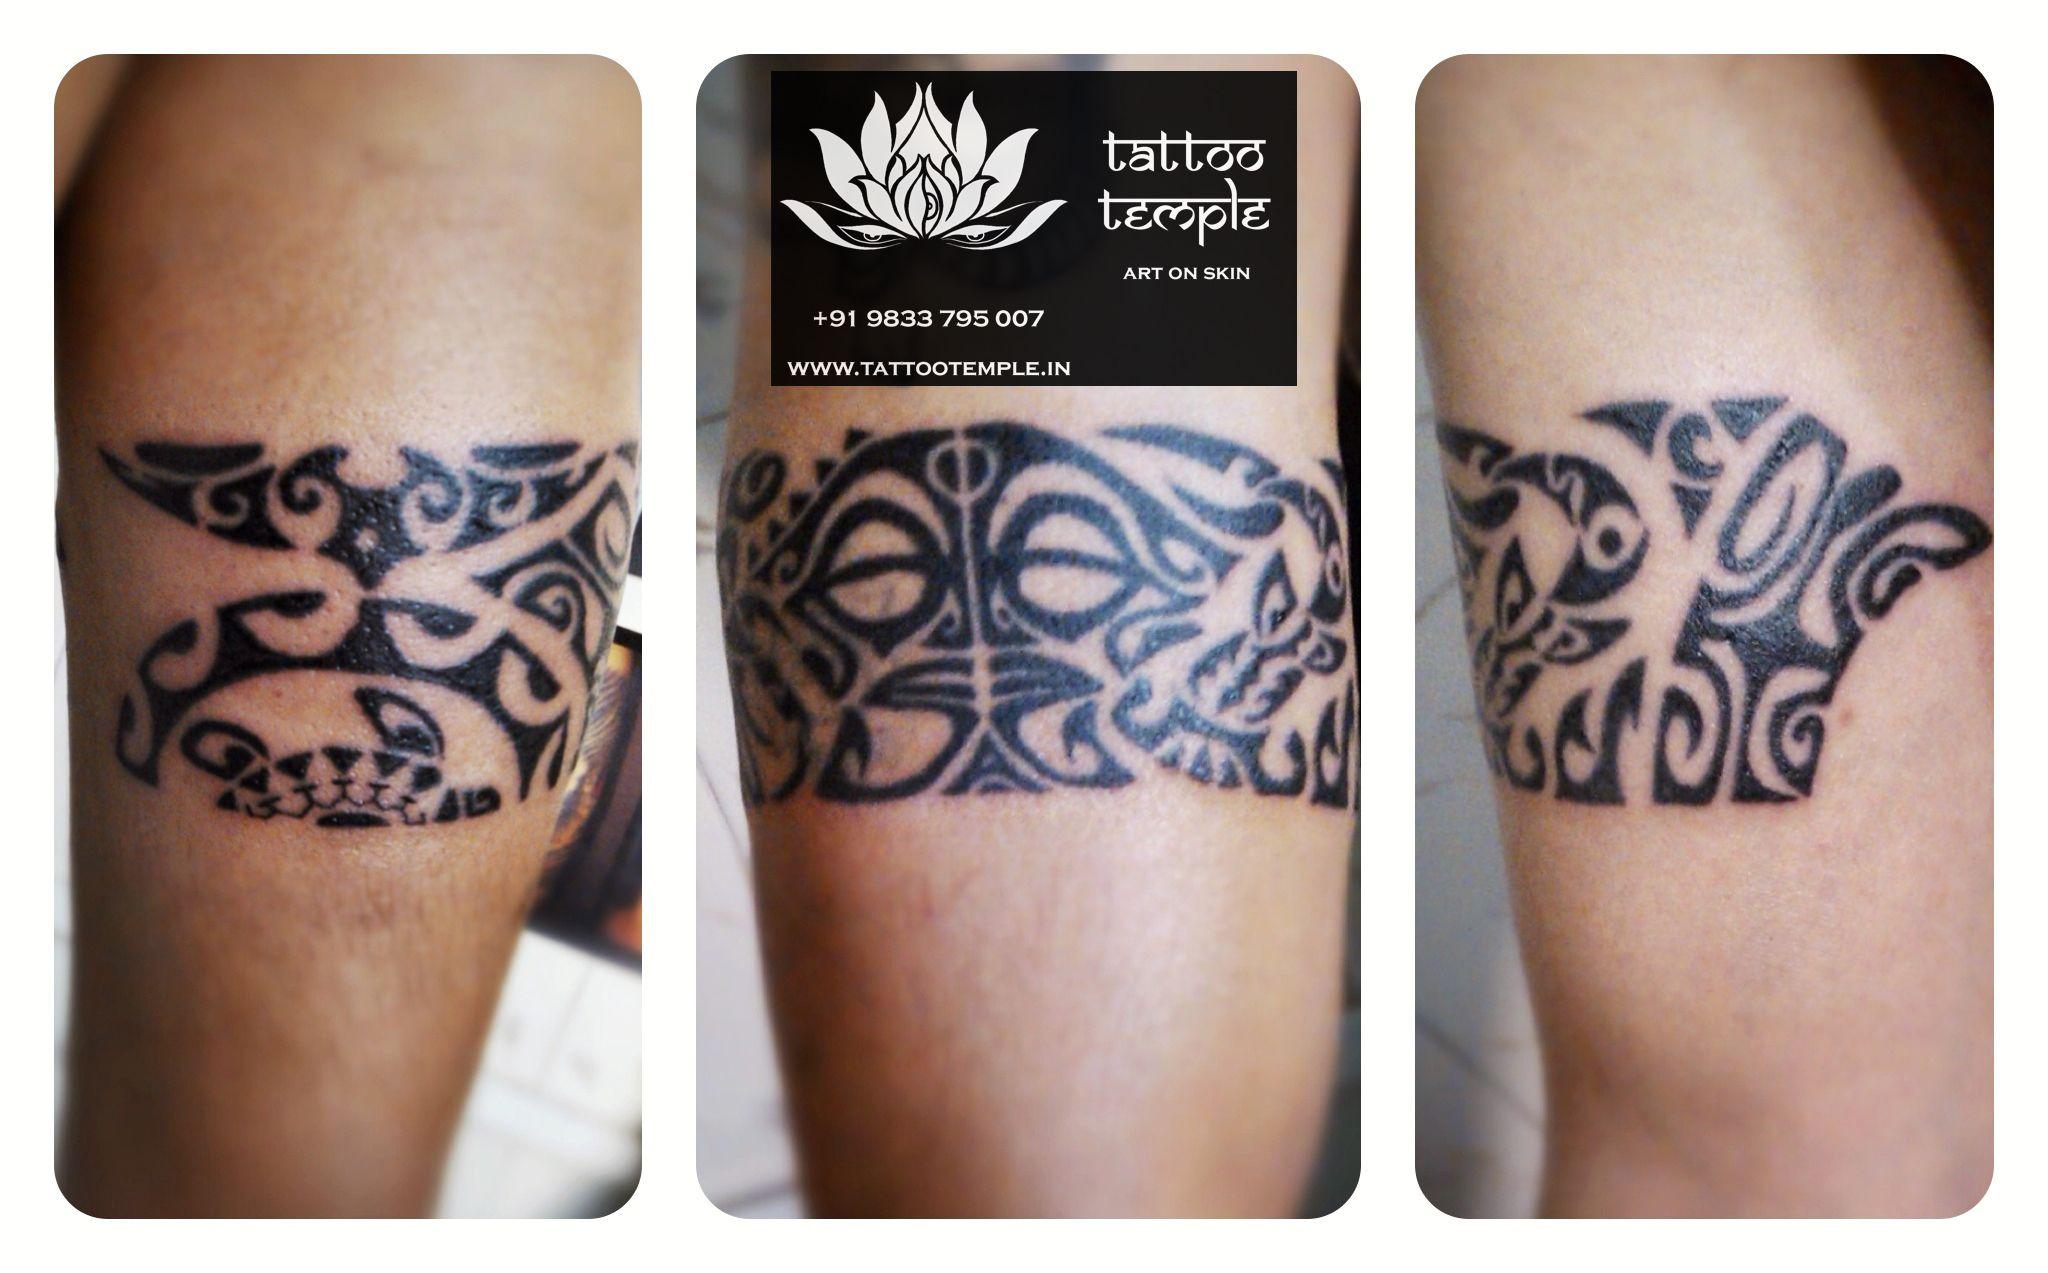 maori arm band tattoo temple maori band tattoos pinterest. Black Bedroom Furniture Sets. Home Design Ideas